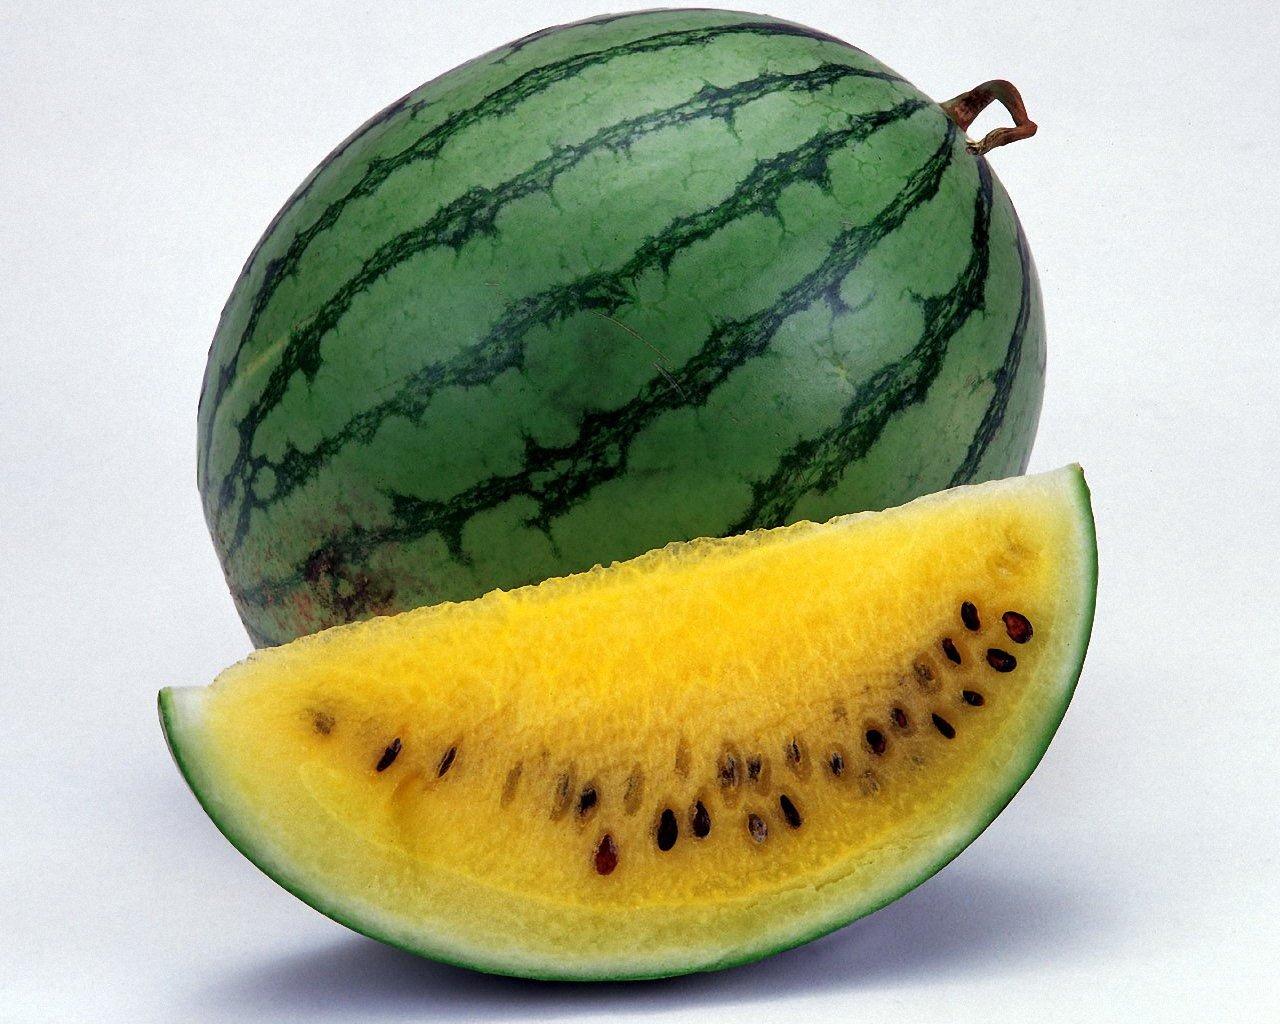 Watermelon wallpapers hd